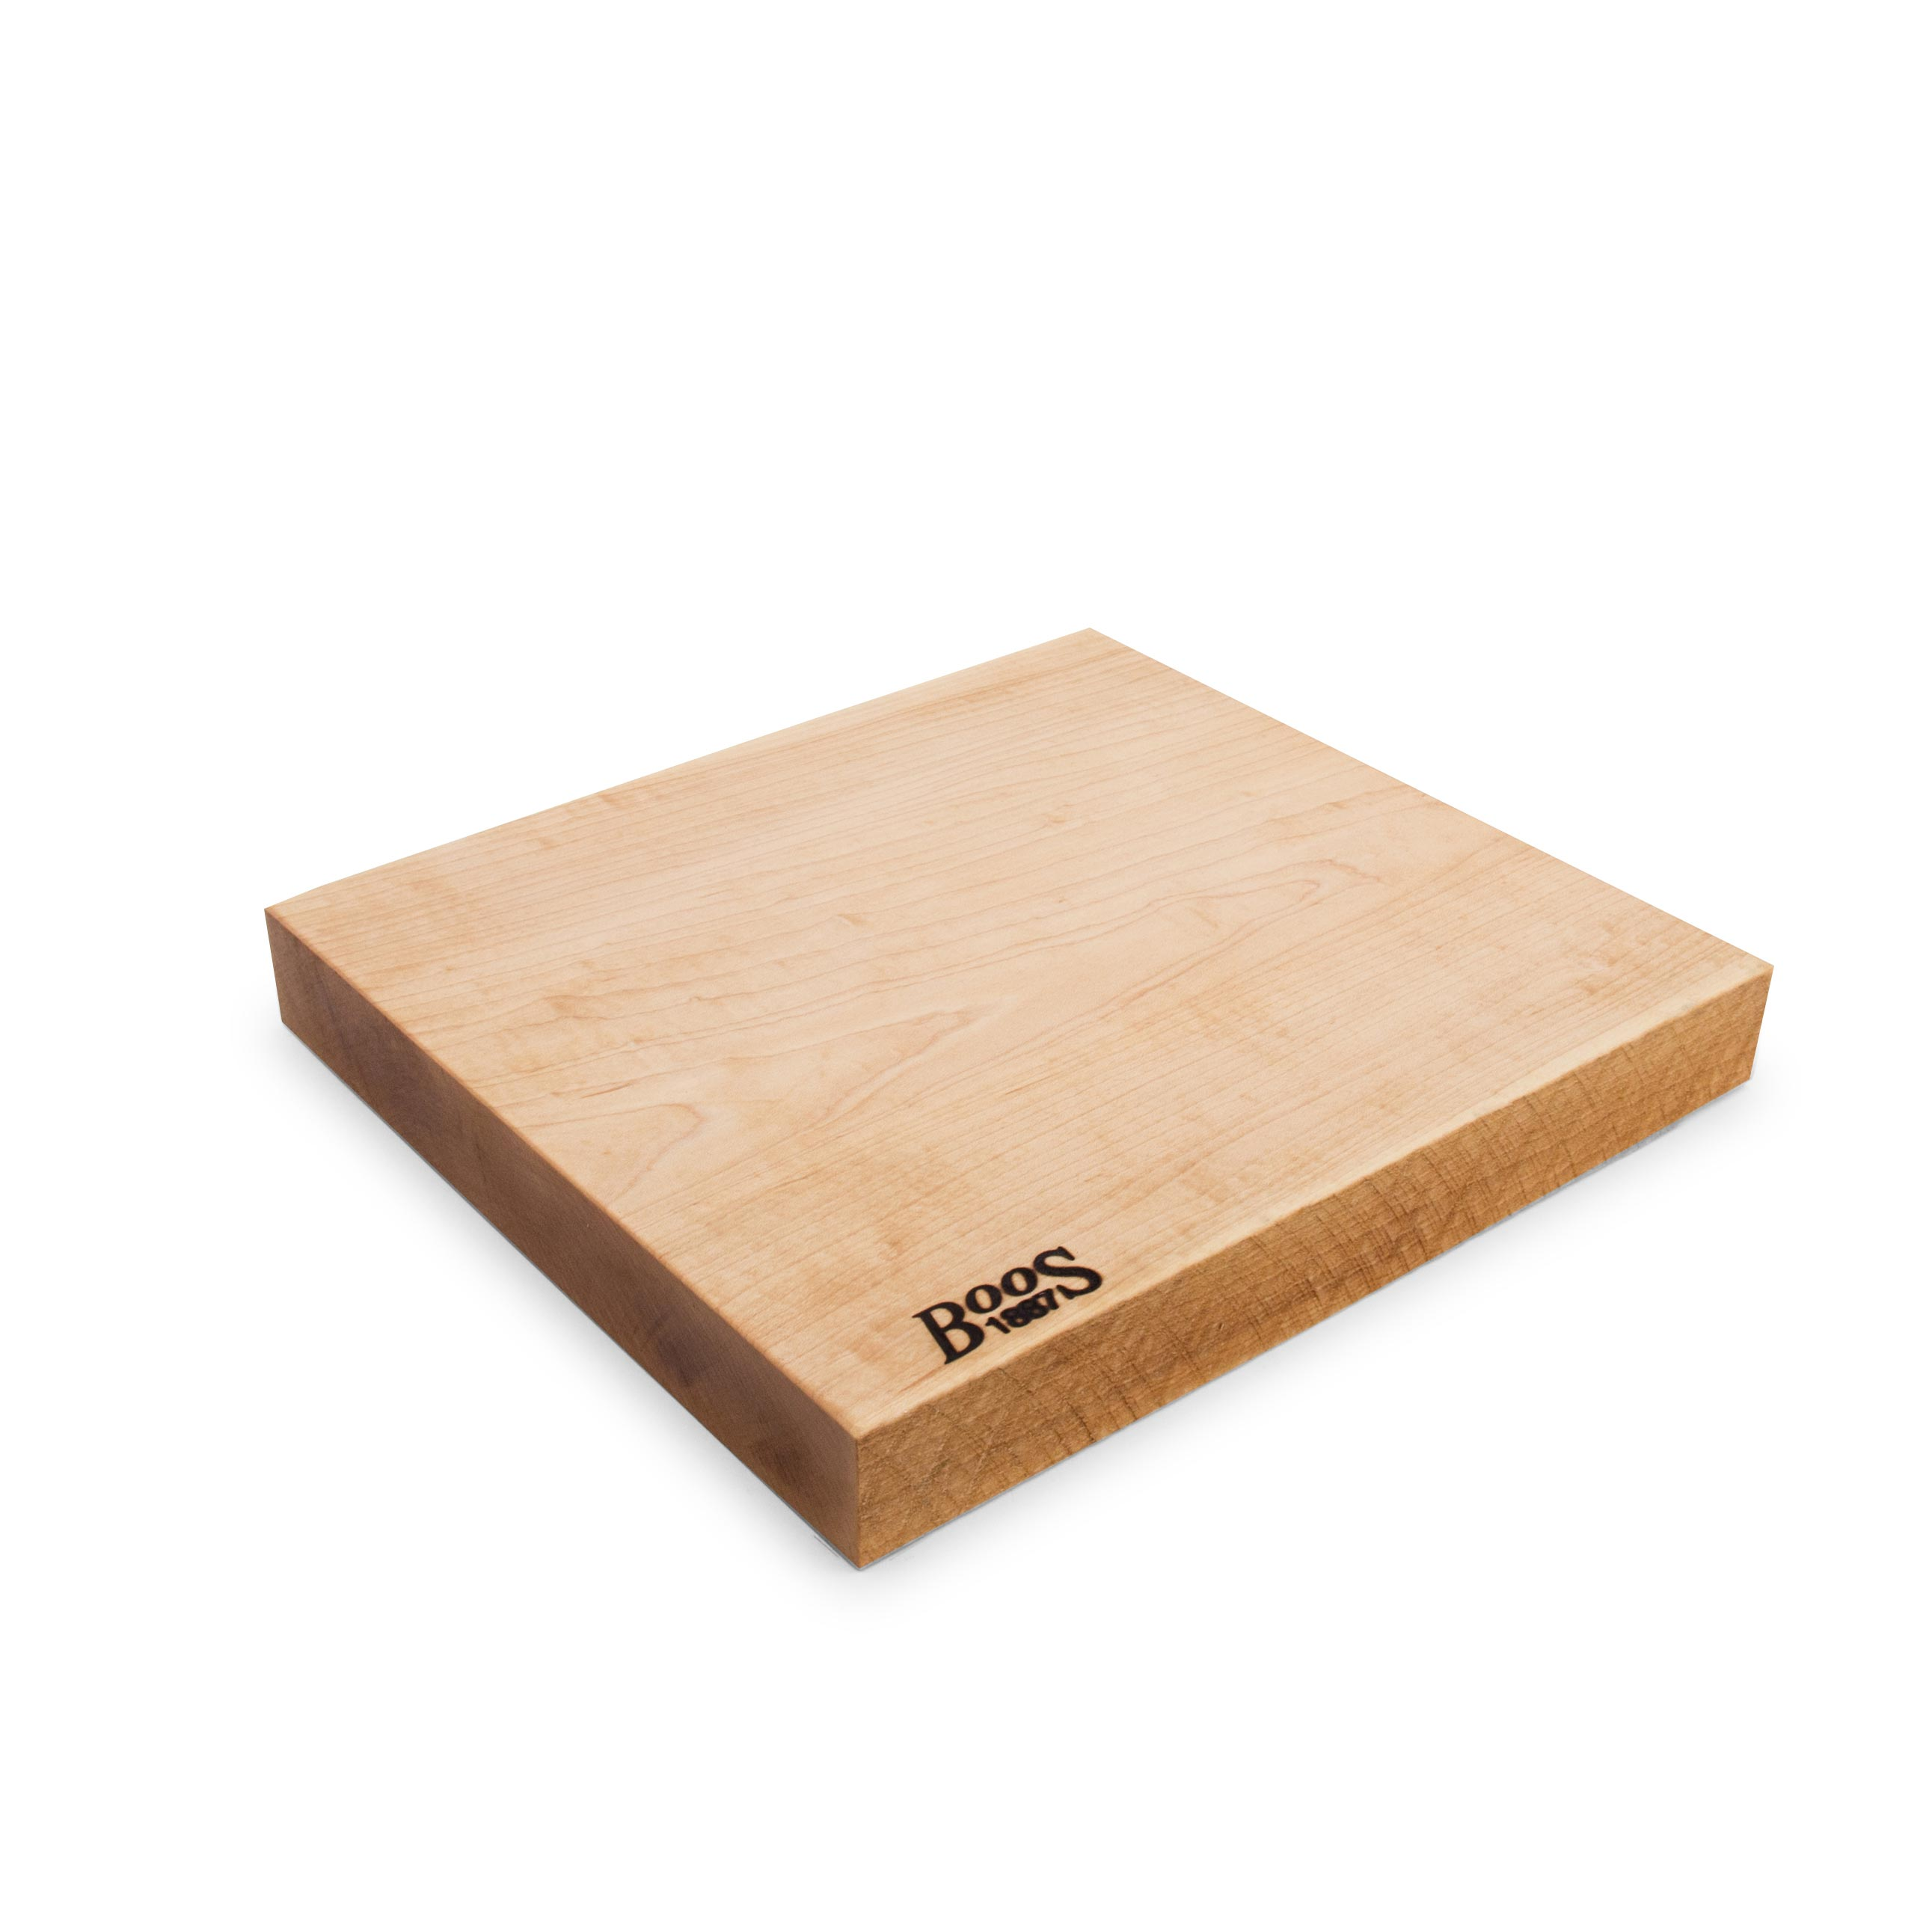 John Boos MPL-RST1712175 cutting board, wood